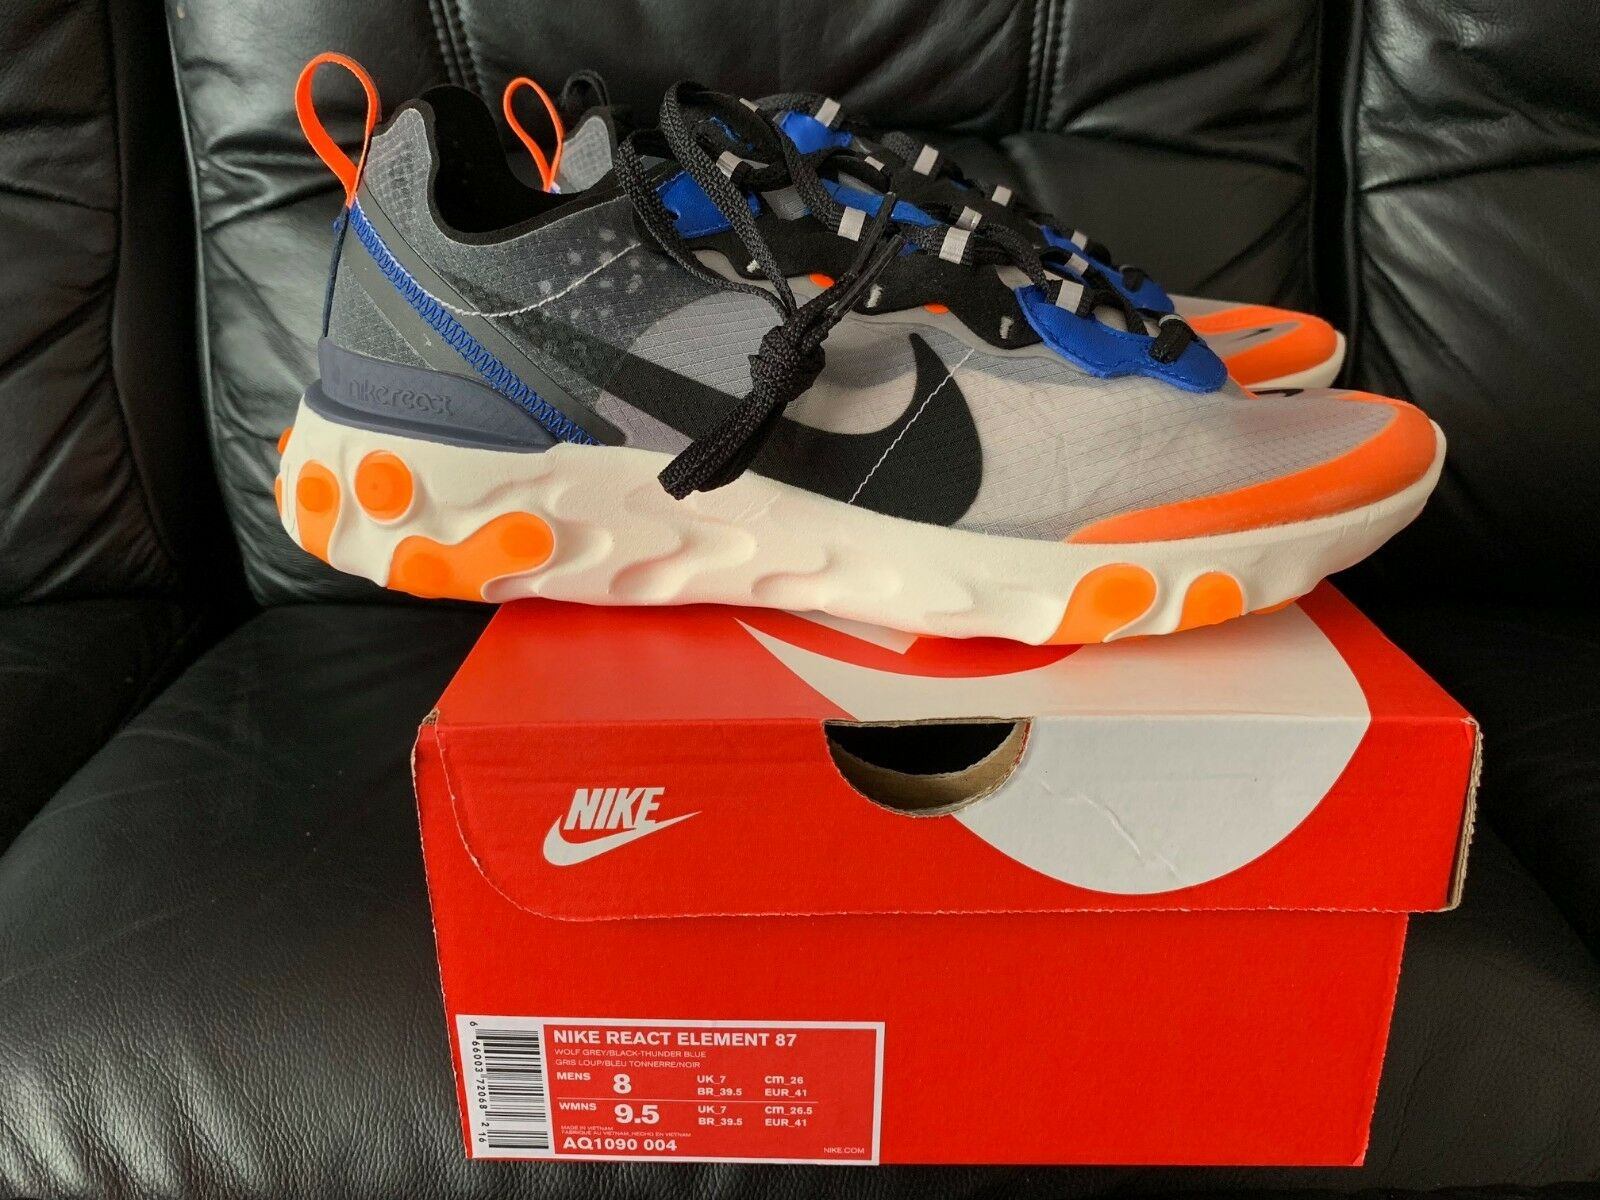 2018 2018 2018 Nike reagire elemento 87 Thunder Blue Arancione totale Tutte Le Taglie NUOVO 198507